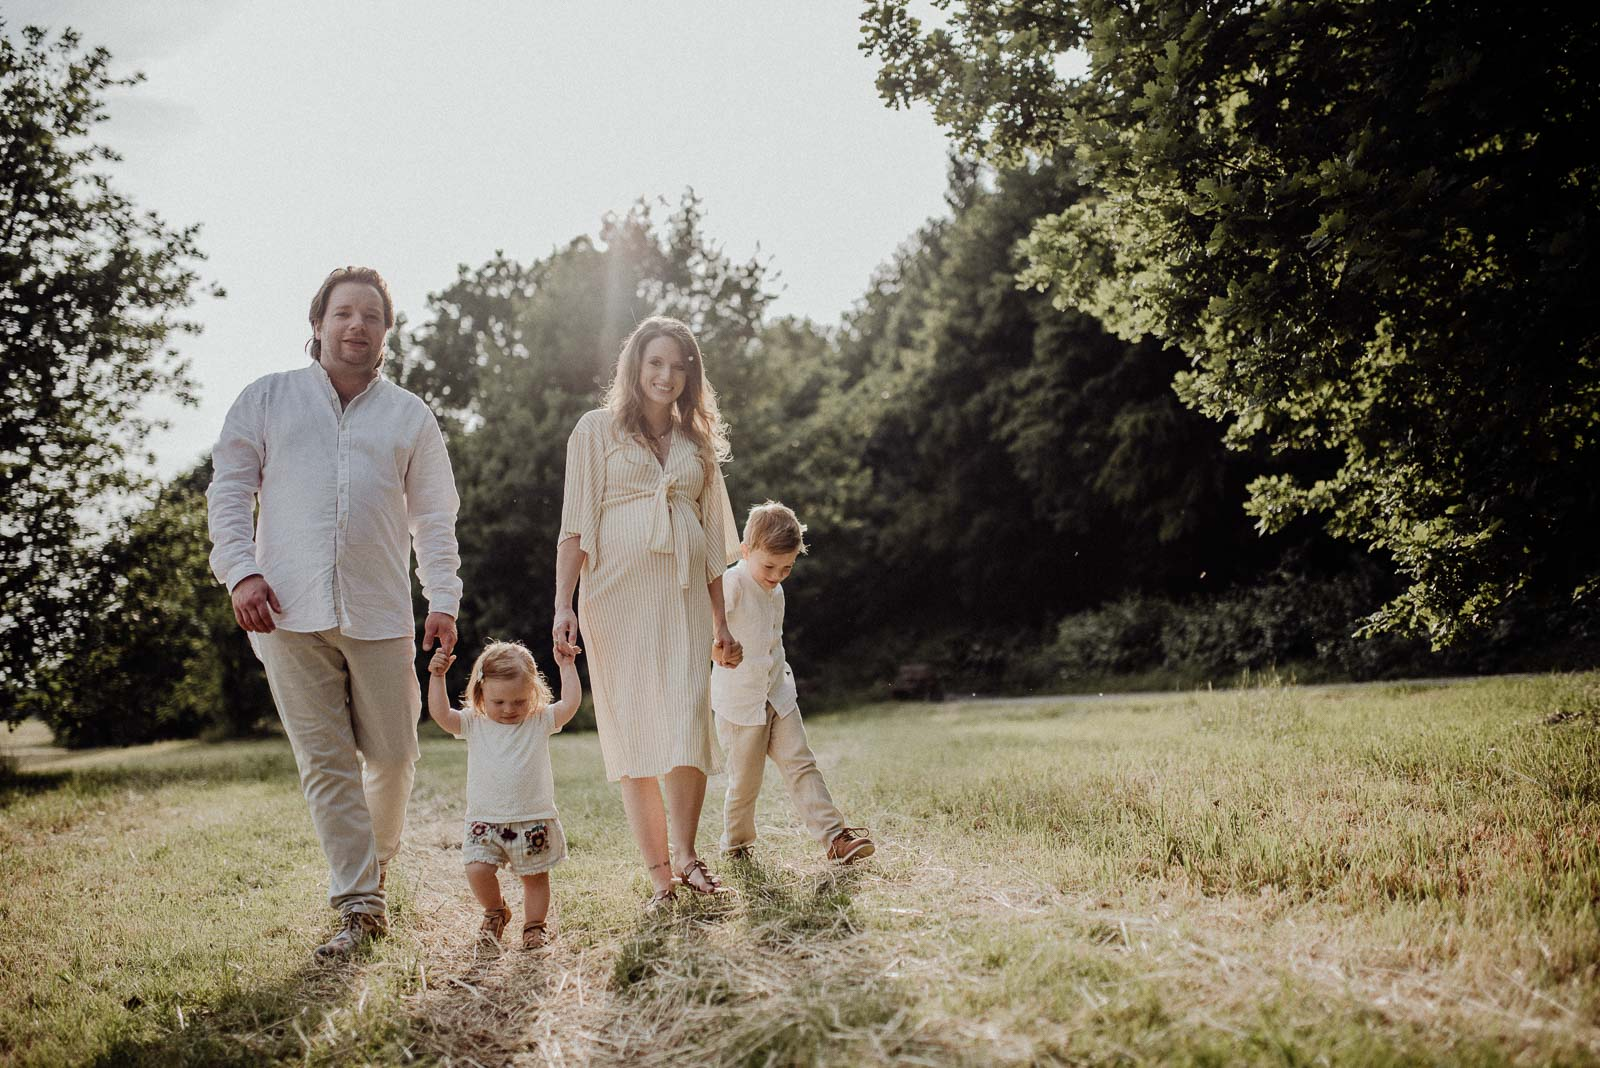 014-familien-fotoshooting-herne-heide